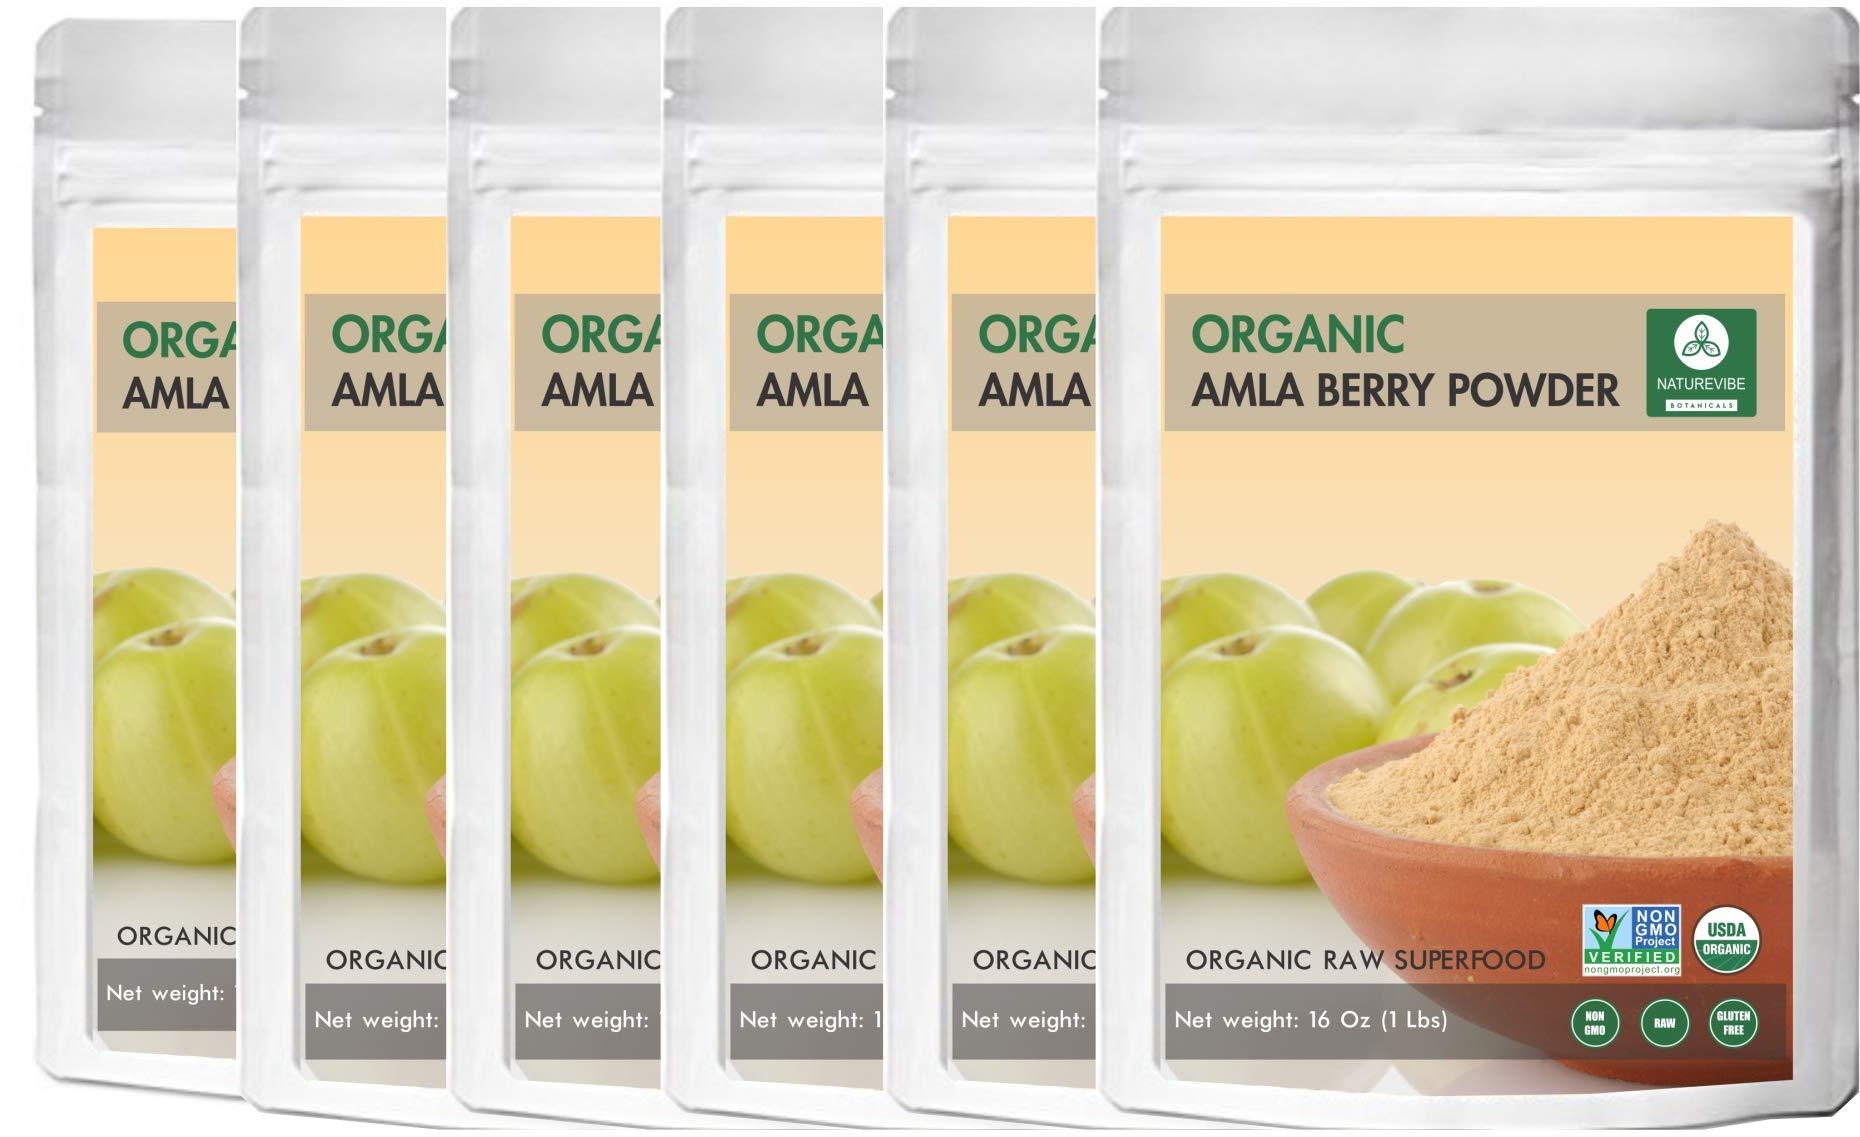 Organic Amla Berry Powder 5lbs (5 packs of 1lb each) by Naturevibe Botanicals - Organic Gluten-Free, Raw & Non-GMO | Helps improve Hair Health | Source of vitamin C